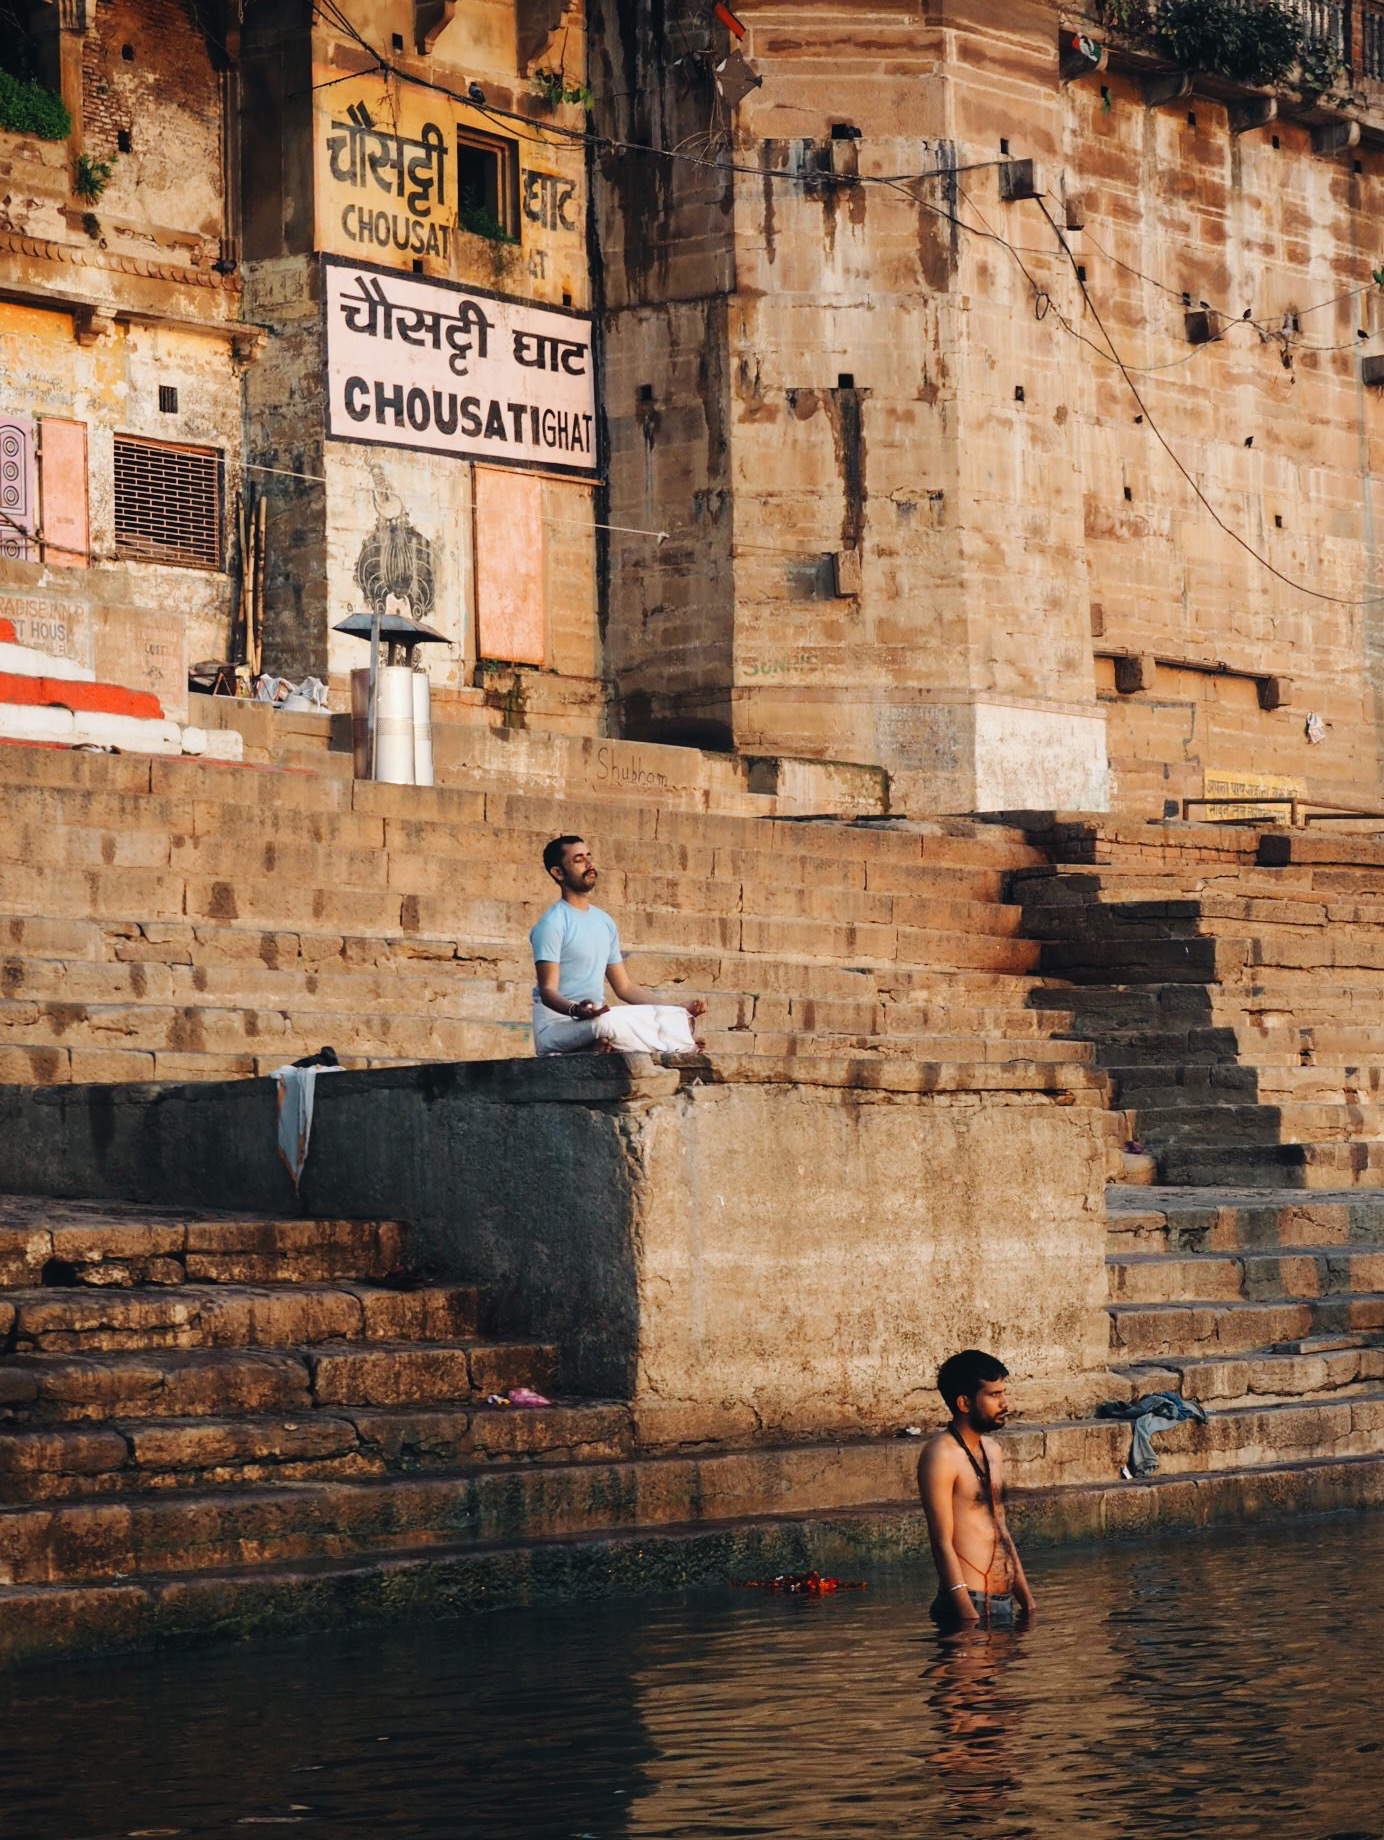 India_2017_Varanasi25.jpg